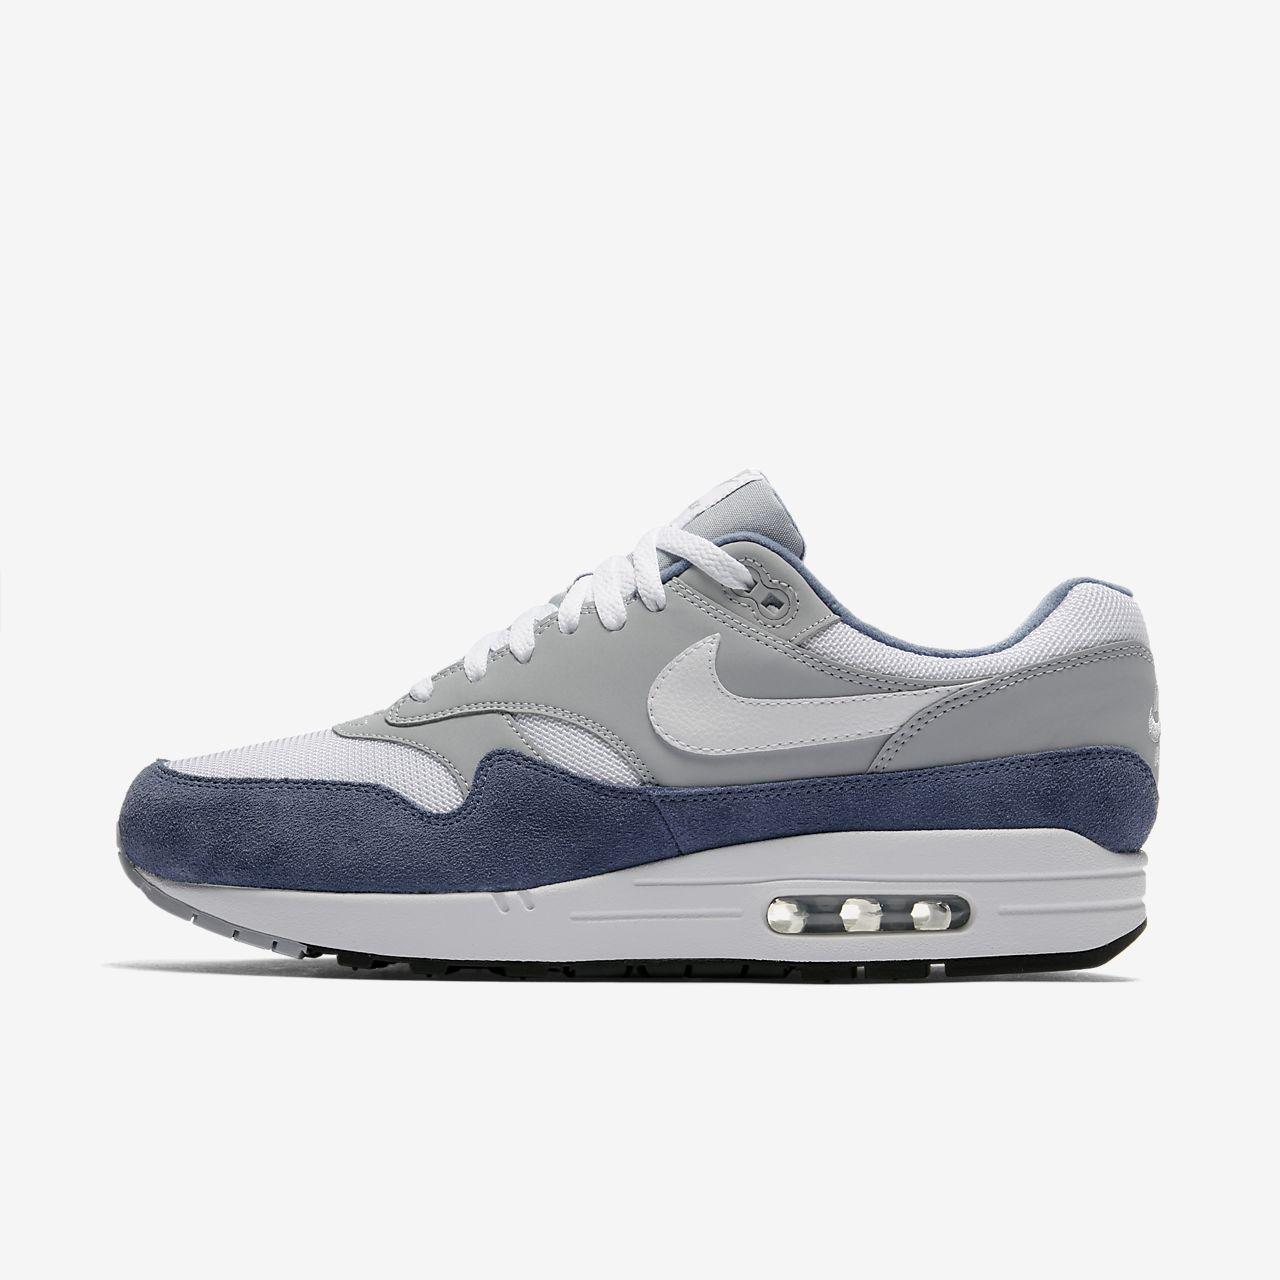 9acc3e69d4 8cf39 01fa5; discount code for nike air max 1 mens shoe 53faa e303f